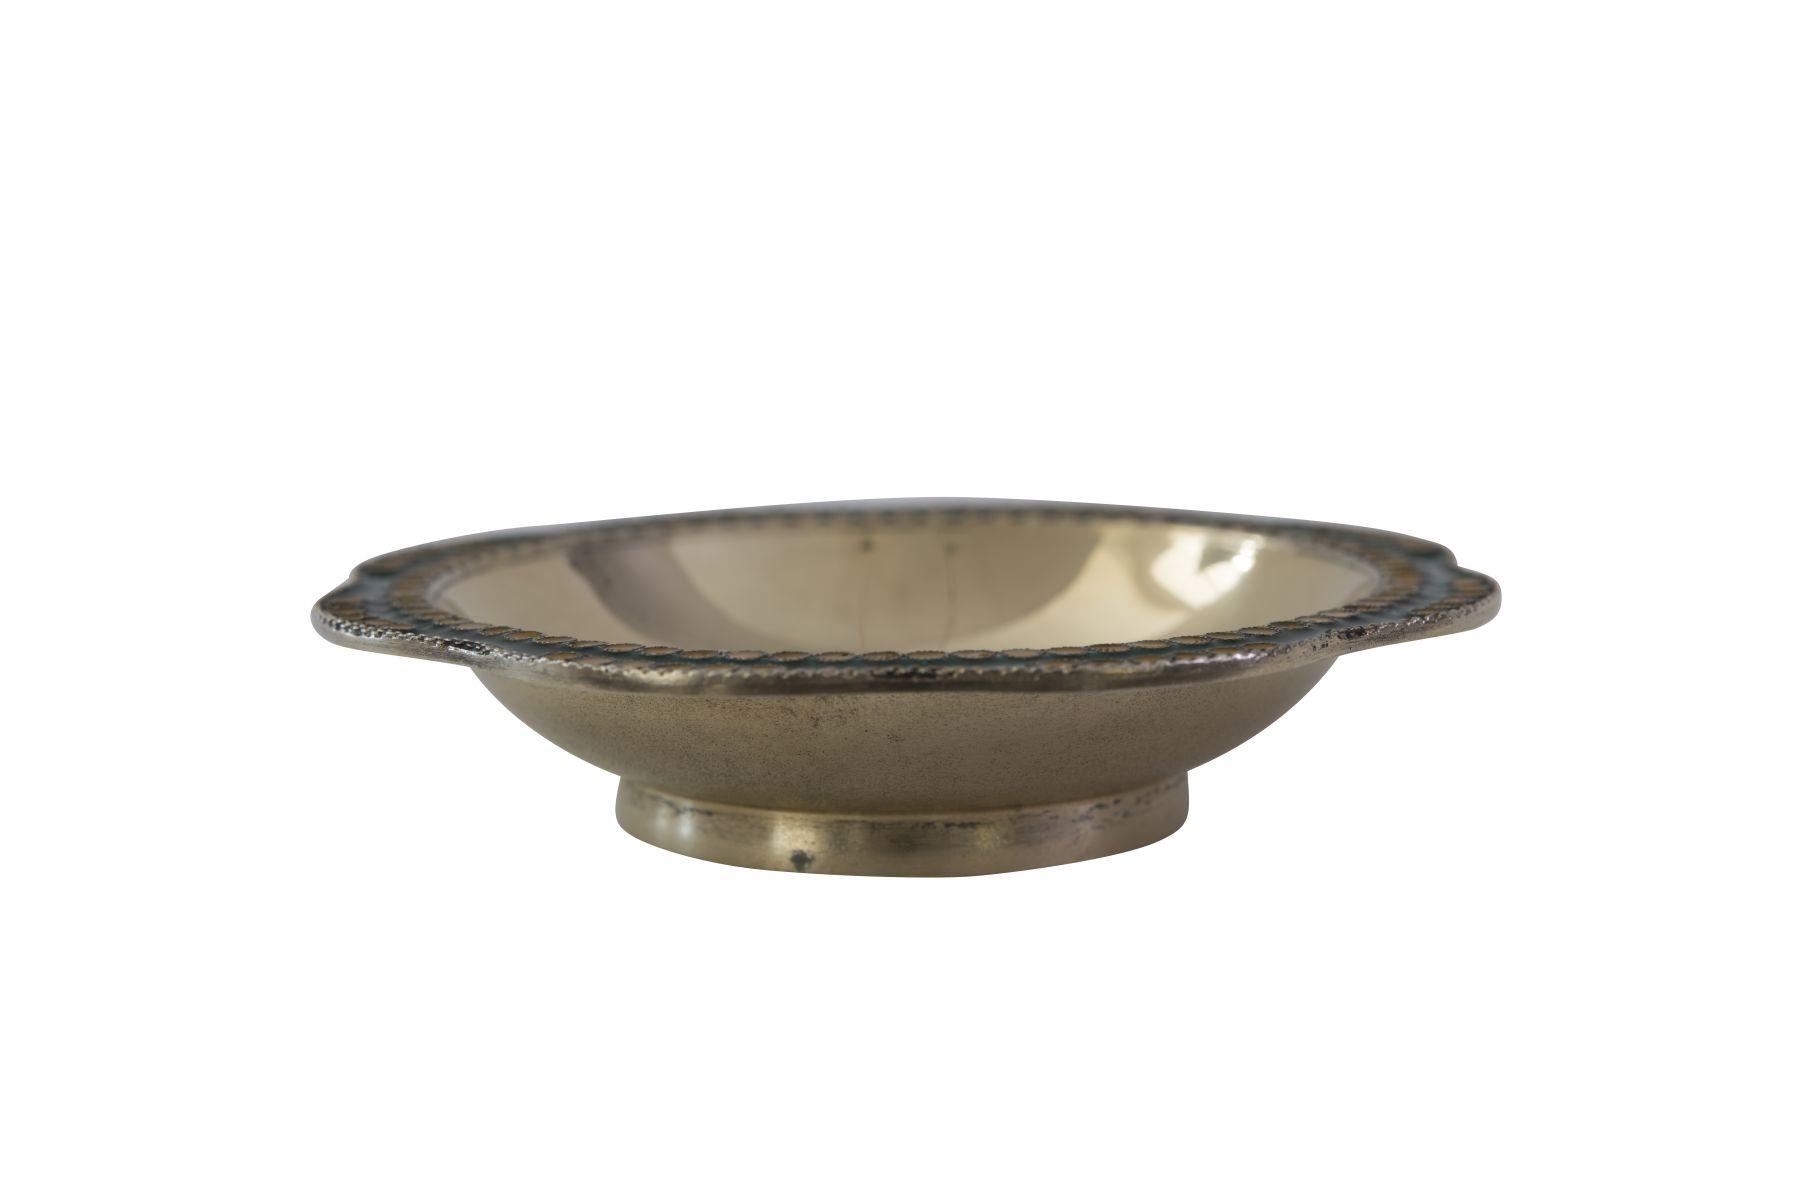 #94 5 small Russian silver bowls | 5 kleine russische Silber Schalen Image